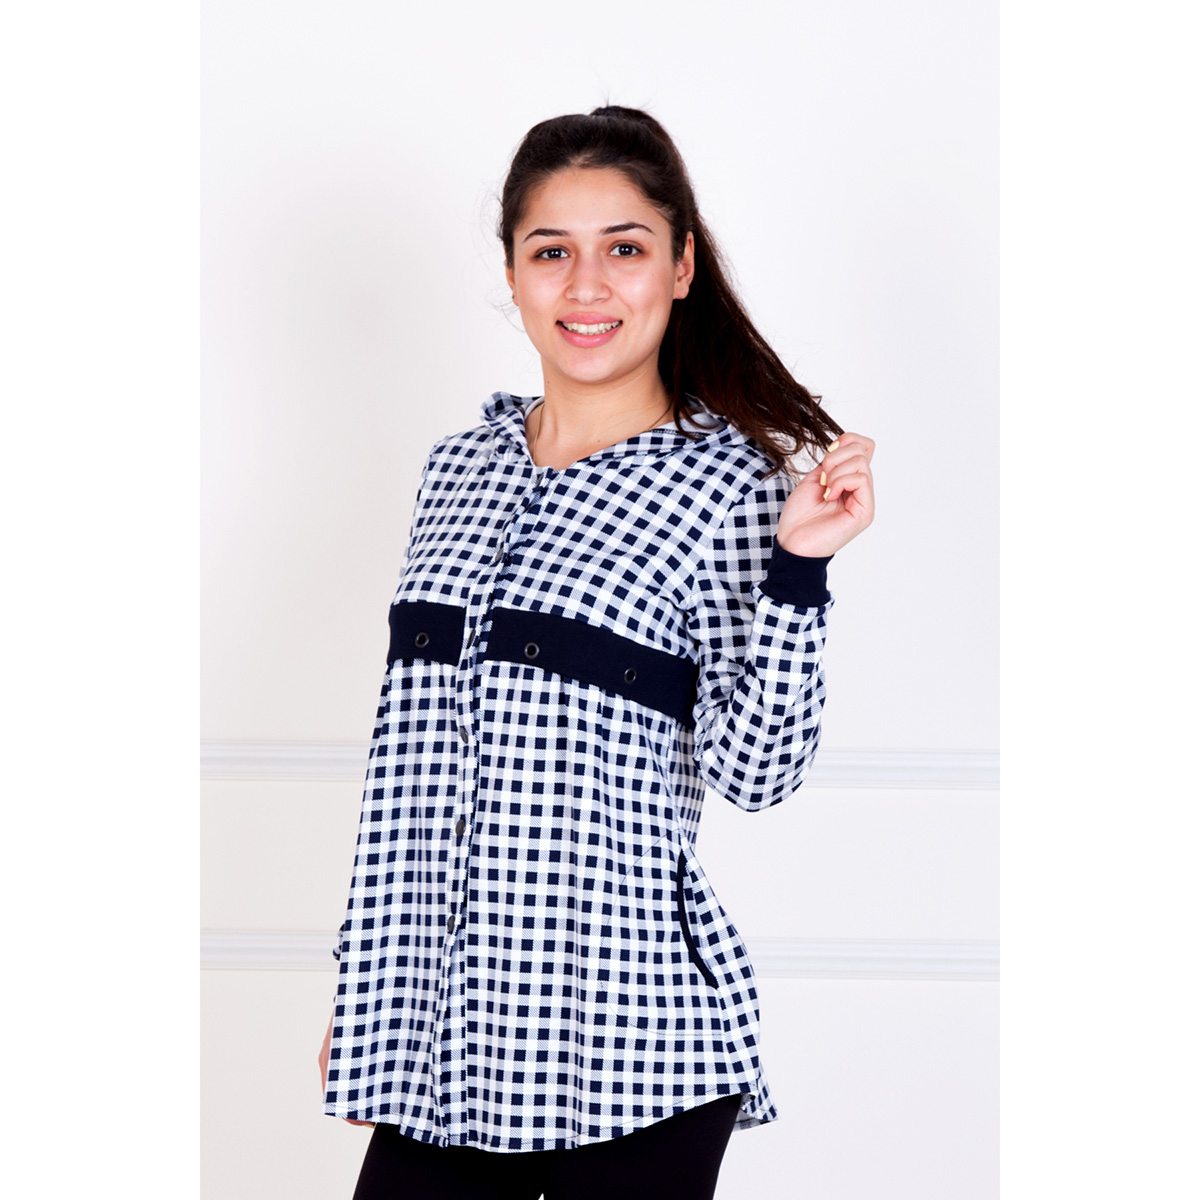 Жен. рубашка Фортуна р. 50Блузки, майки, кофты<br>Обхват груди:100 см<br>Обхват талии:82 см<br>Обхват бедер:108 см<br>Длина по спинке:69 см<br>Рост:167 см<br><br>Тип: Жен. рубашка<br>Размер: 50<br>Материал: Интерлок